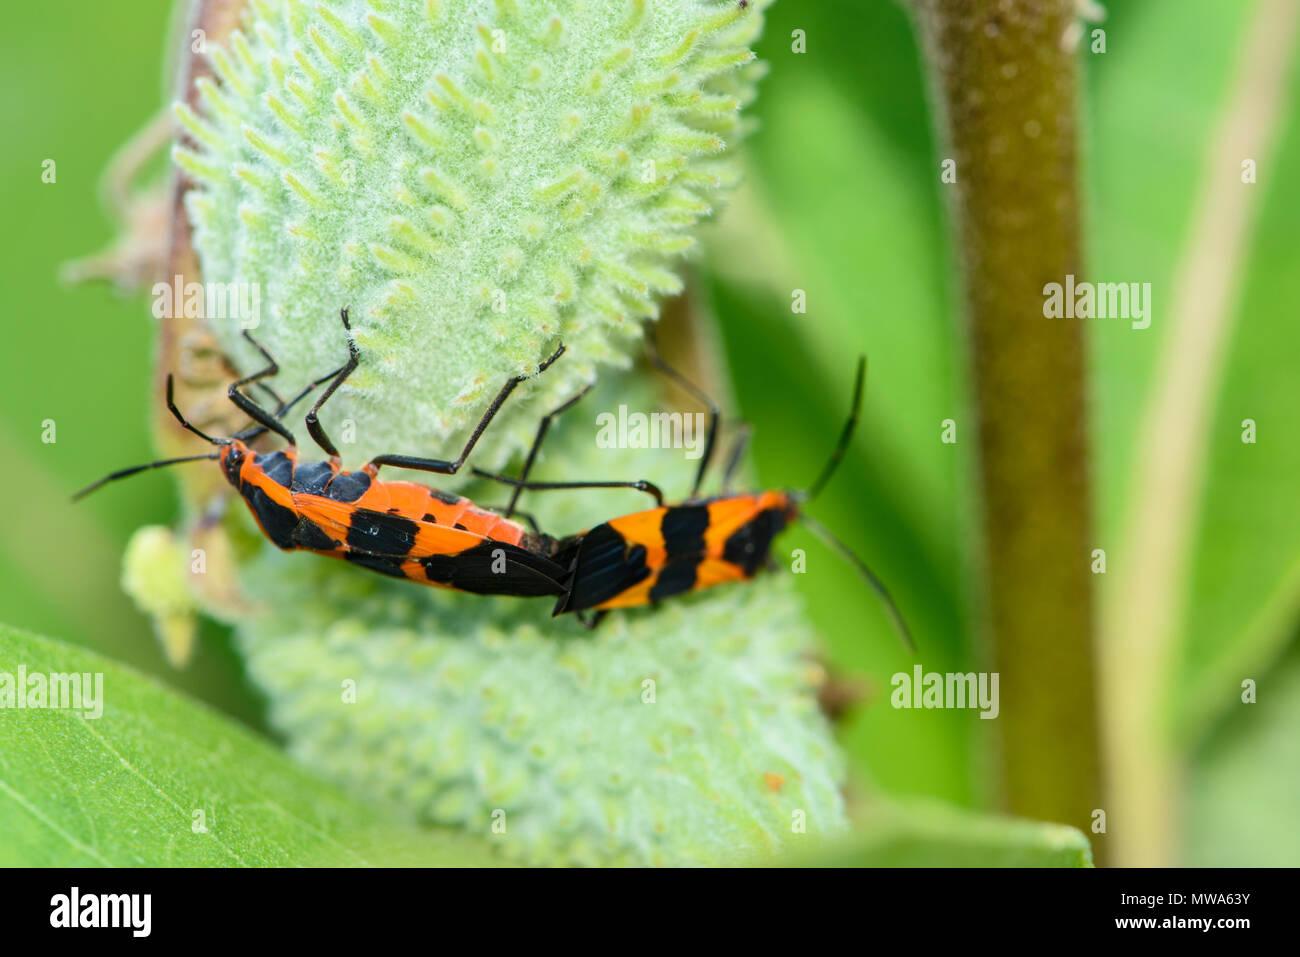 Large milkweed bug (Oncopeltus fasciatus), Greater Sudbury, Ontario, Canada - Stock Image